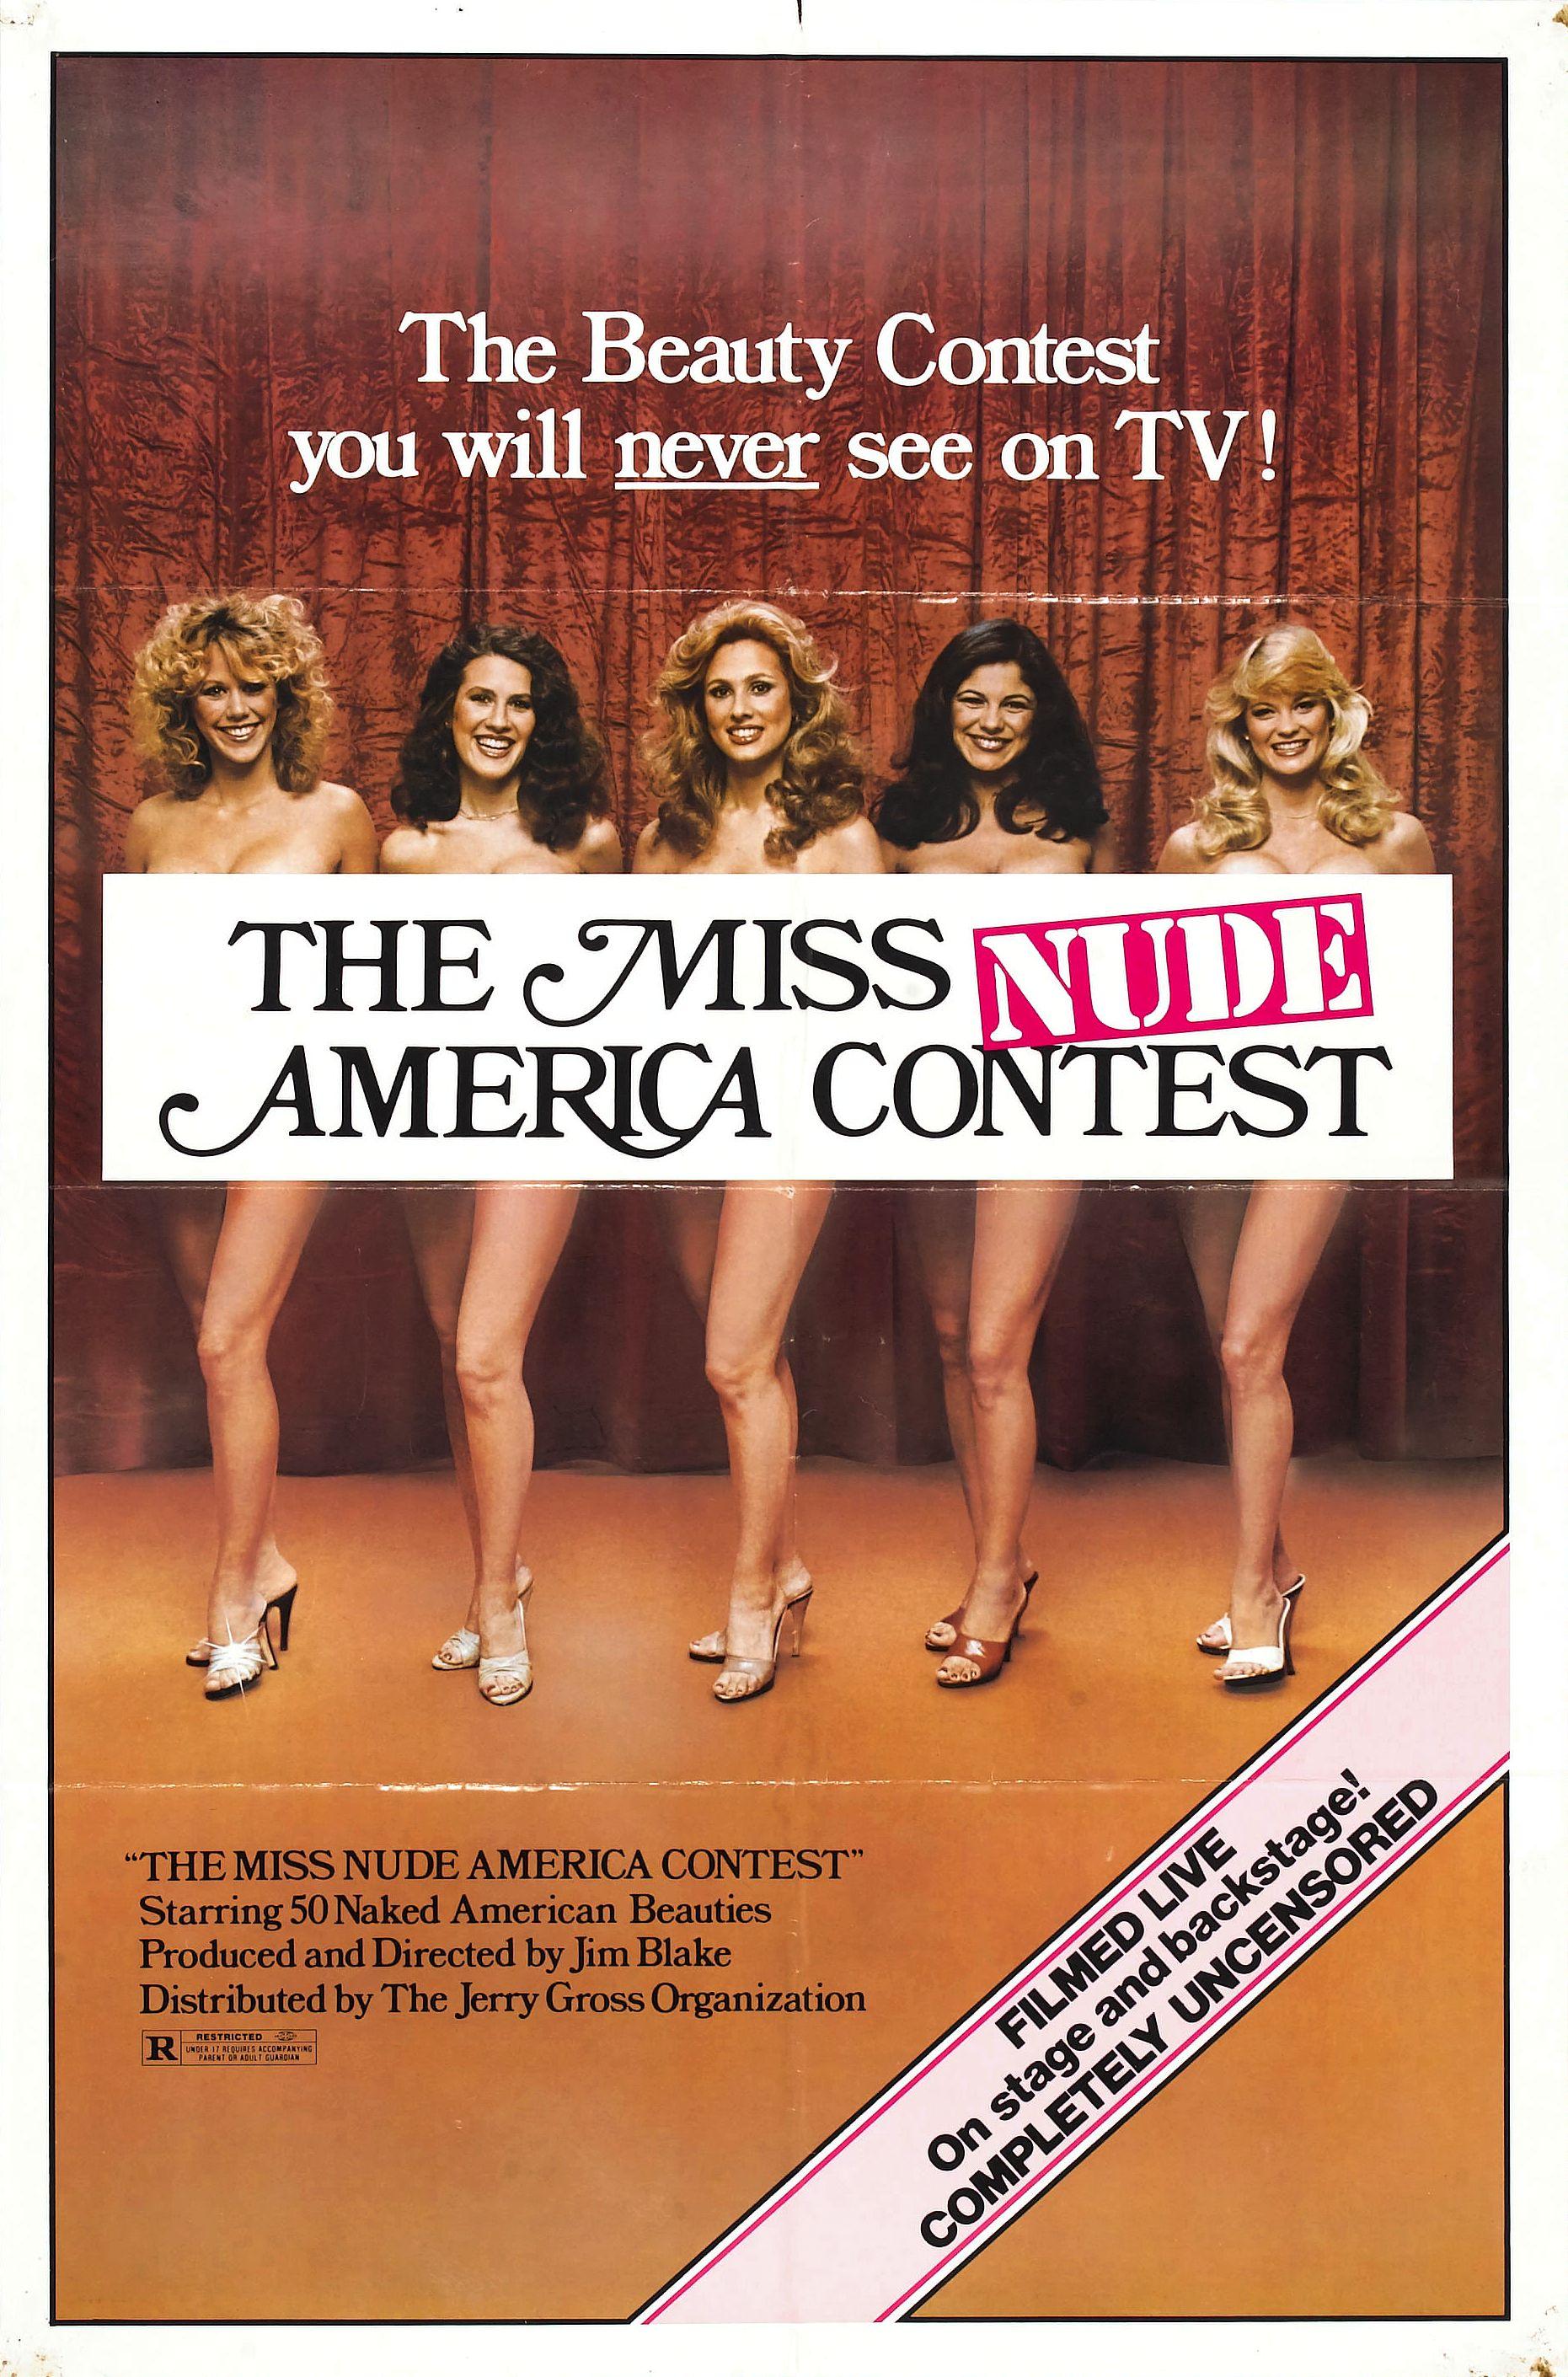 Miss nudist junior competition